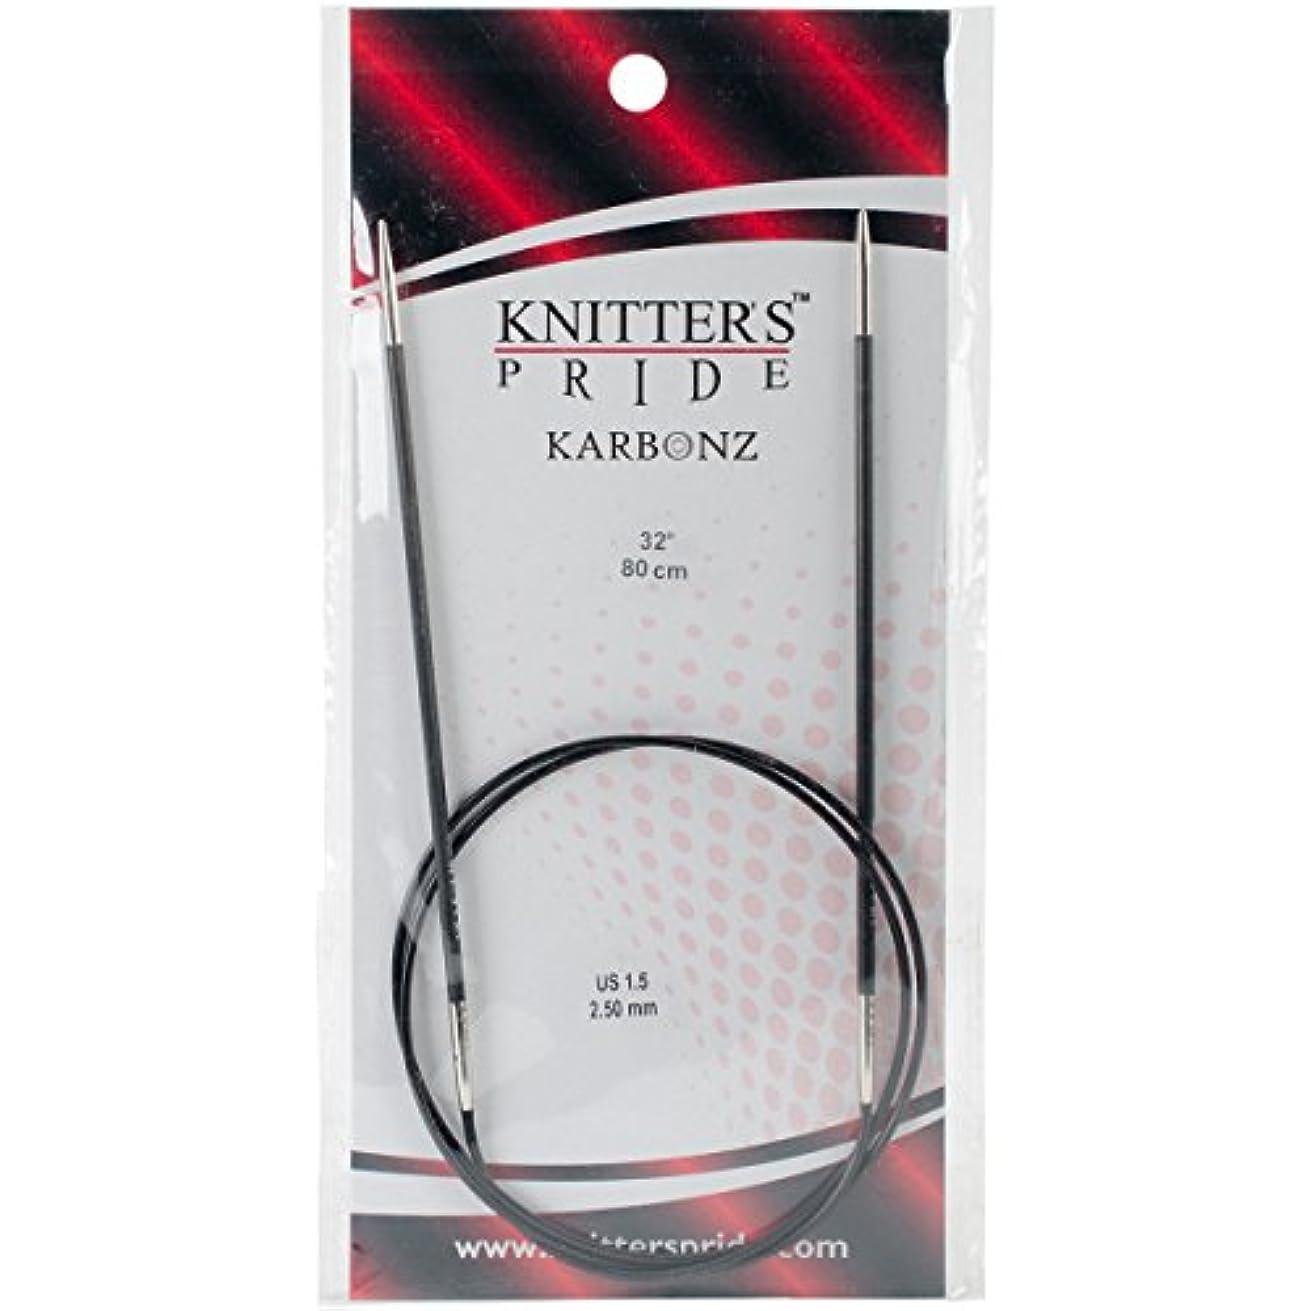 Knitter's Pride Karbonz Circular 32-inch (80cm) Knitting Needles; Size US 1.5 (2.50mm) 110223